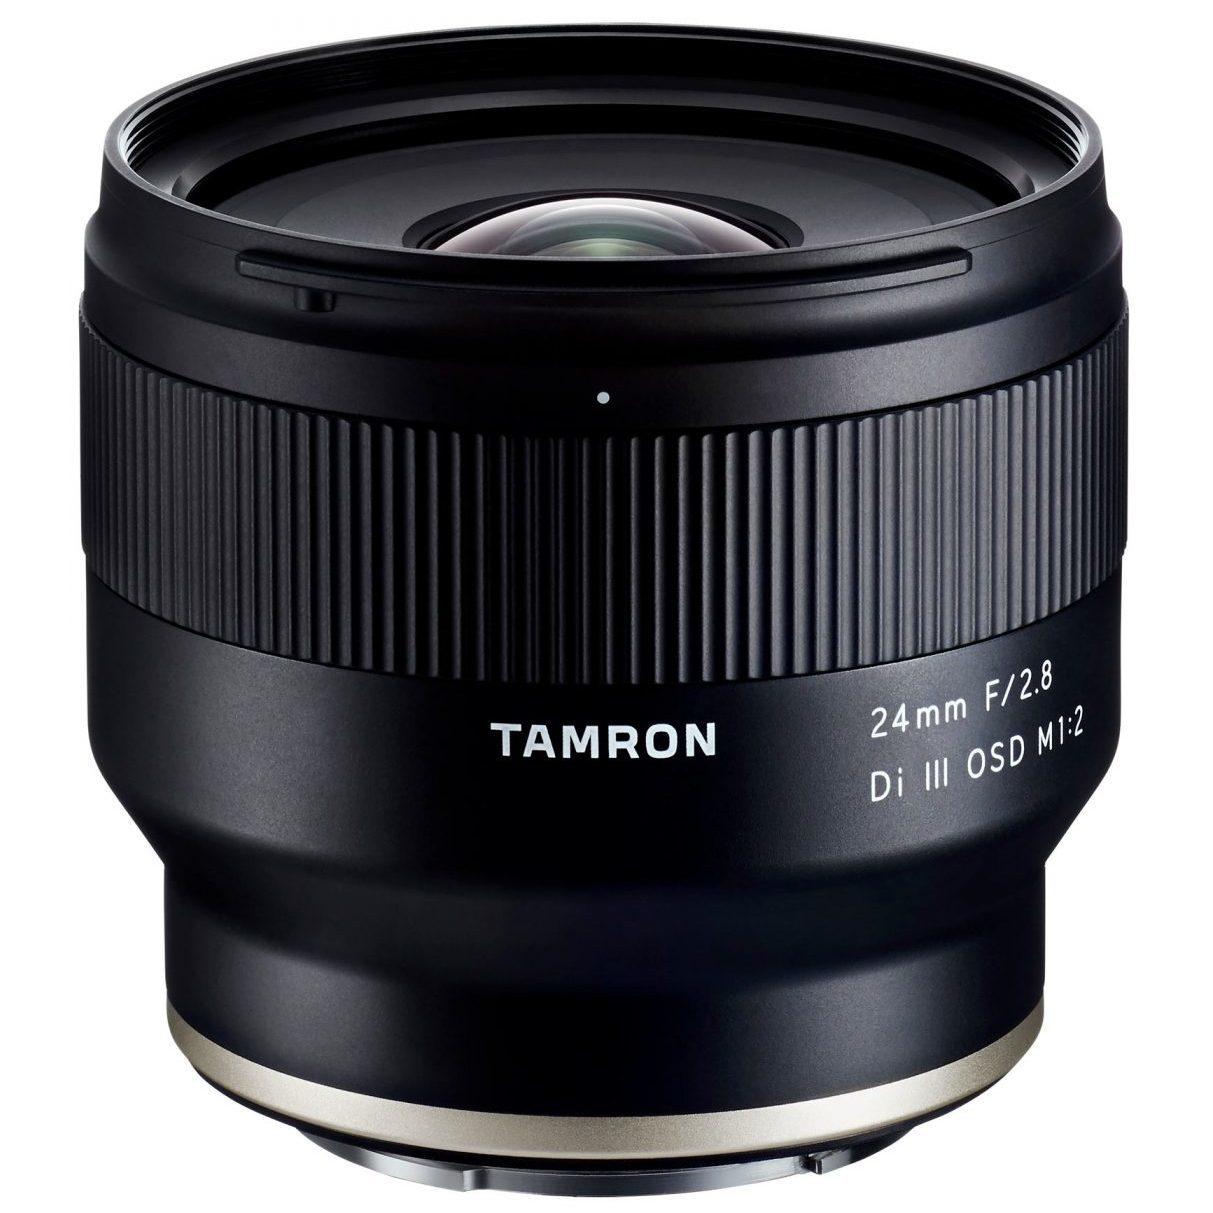 Tamron 24mm F/2.8 Di III OSD (F051) купить в Sony Centre Воронеж